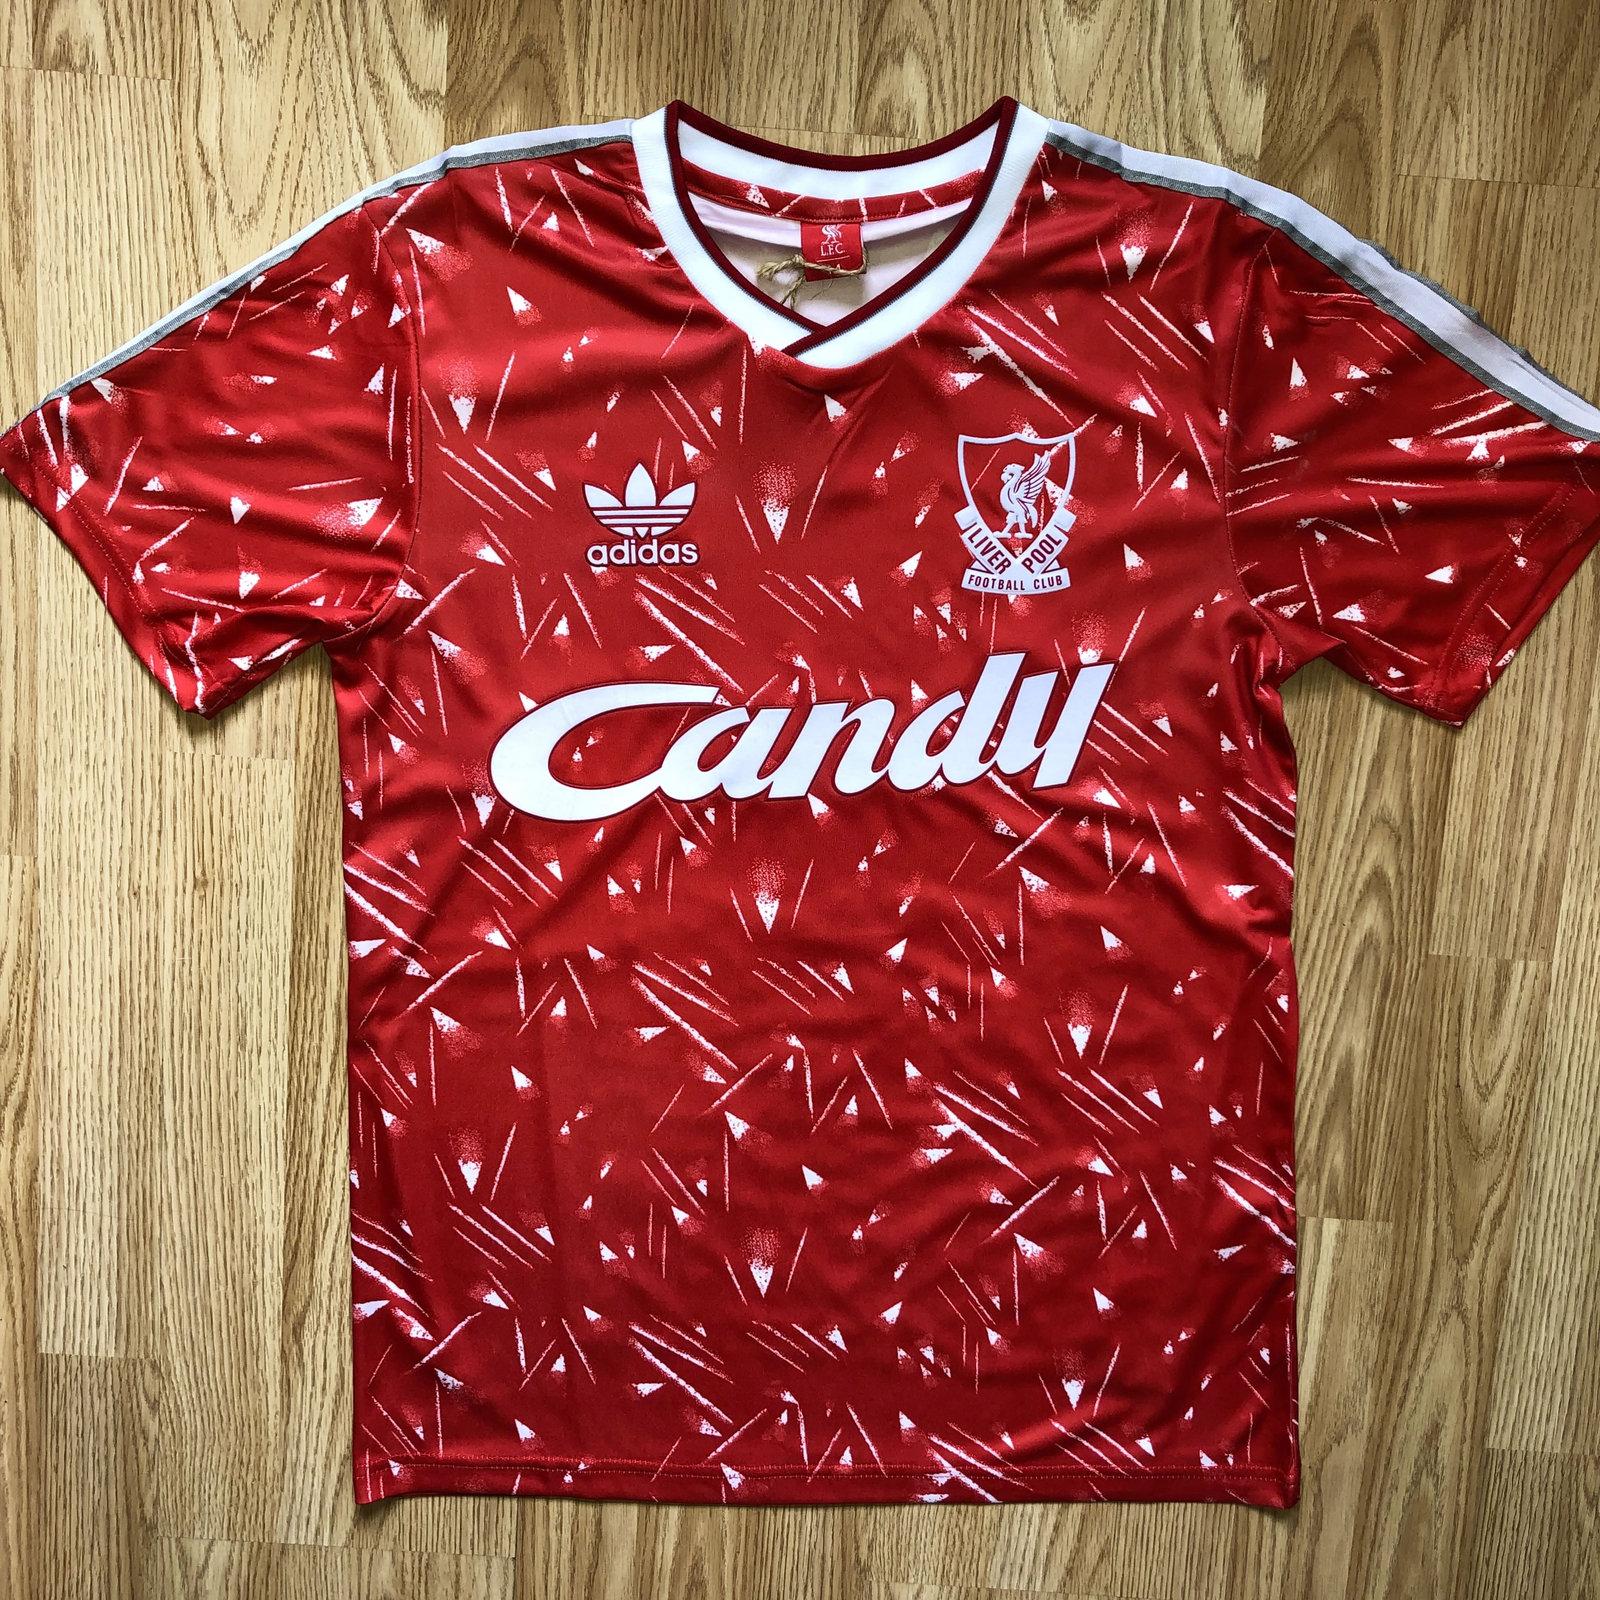 Liverpool Candy Retro Jersey Football Soccer LFC Shirt Top - Men